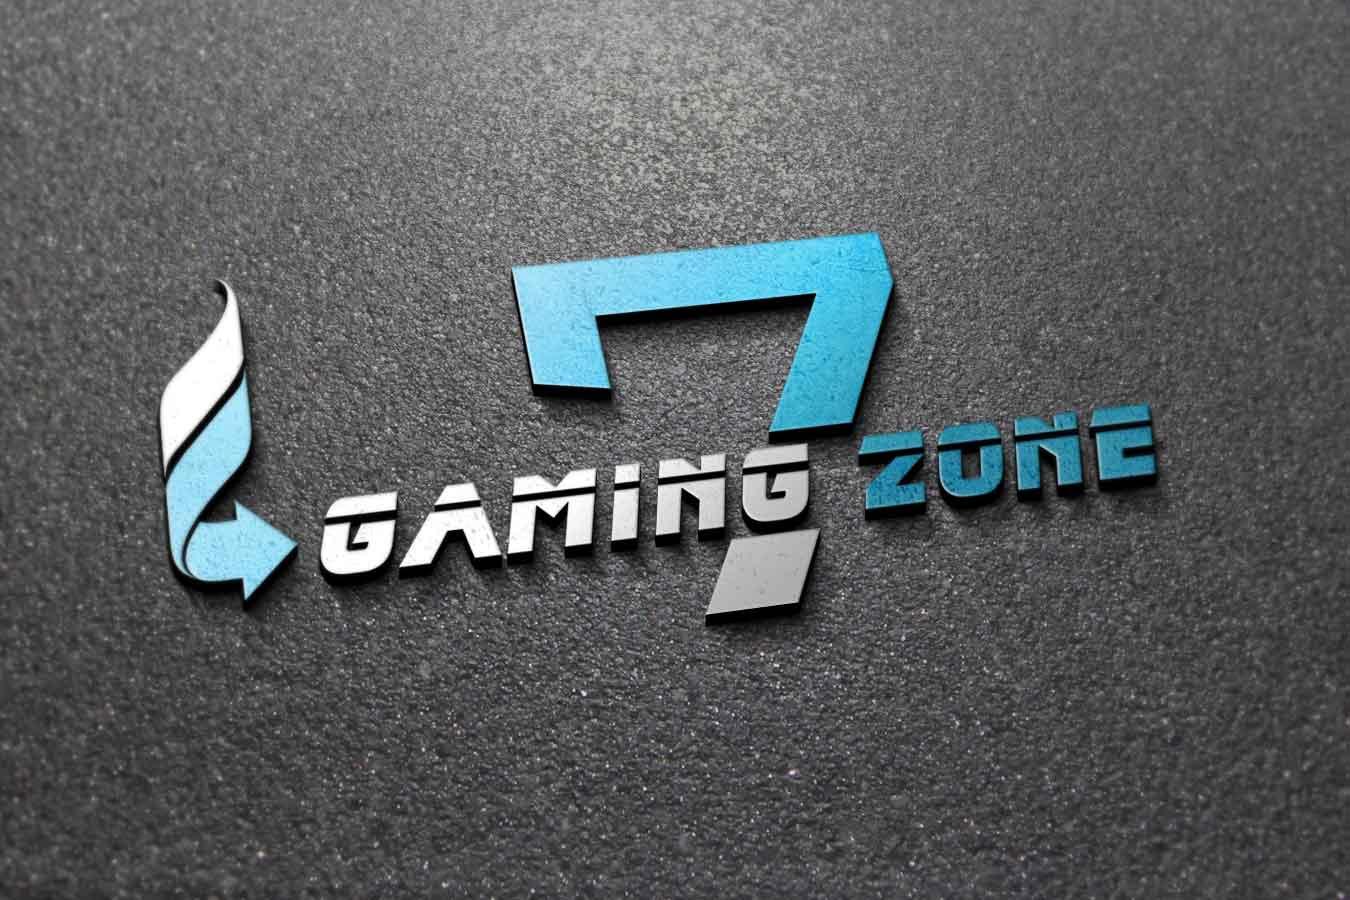 7 gaming zone in tla al ali  amman  jordan